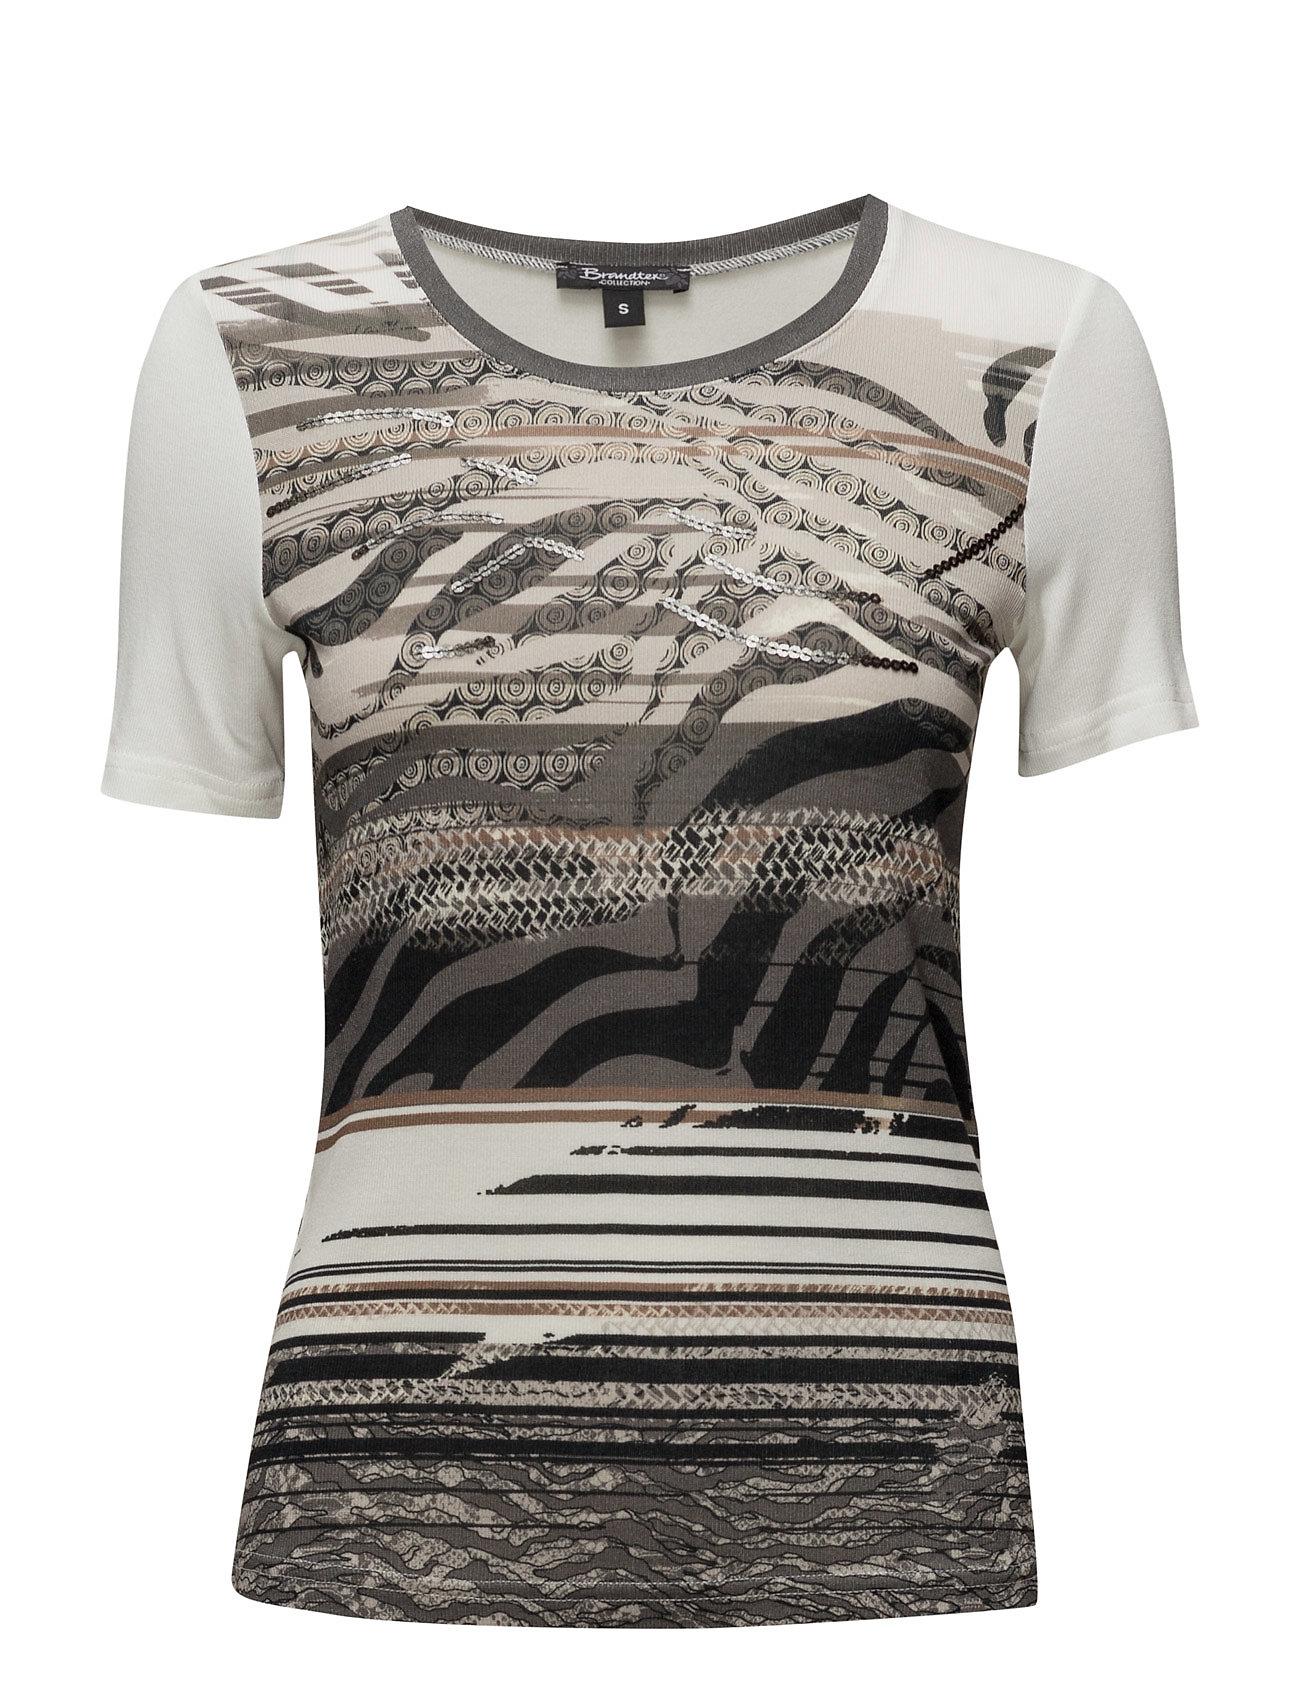 T-Shirt S/S Brandtex Kortærmede til Damer i khaki